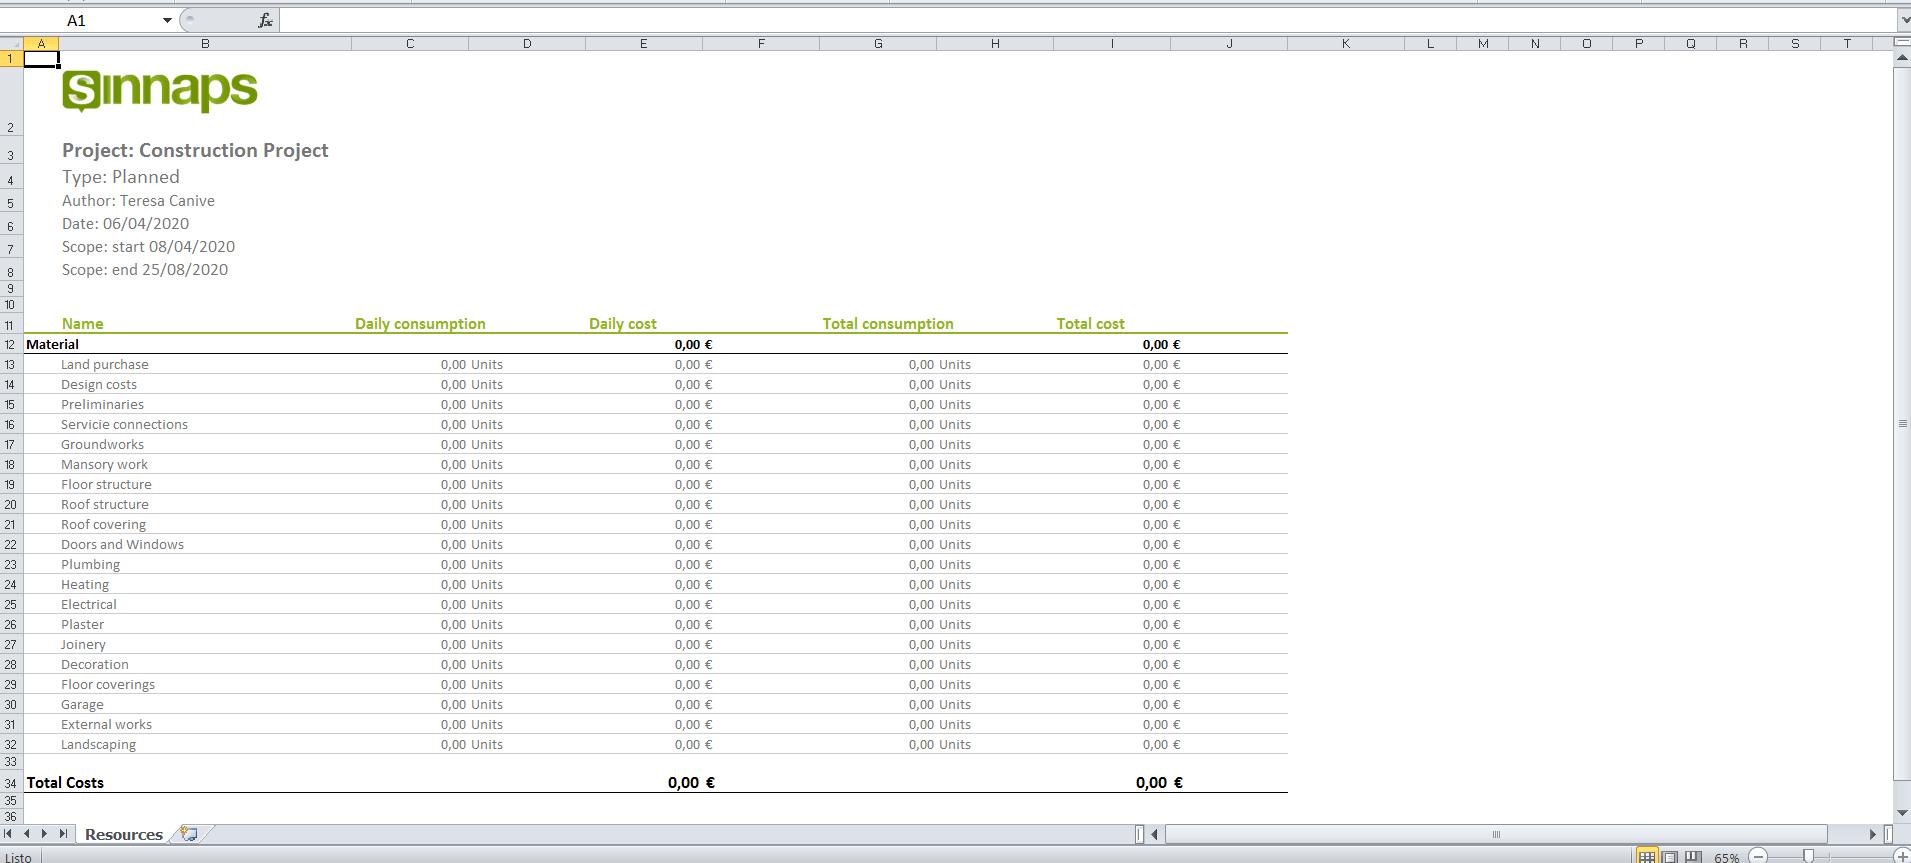 Construction Cost Estimate Template Excel Sinnaps